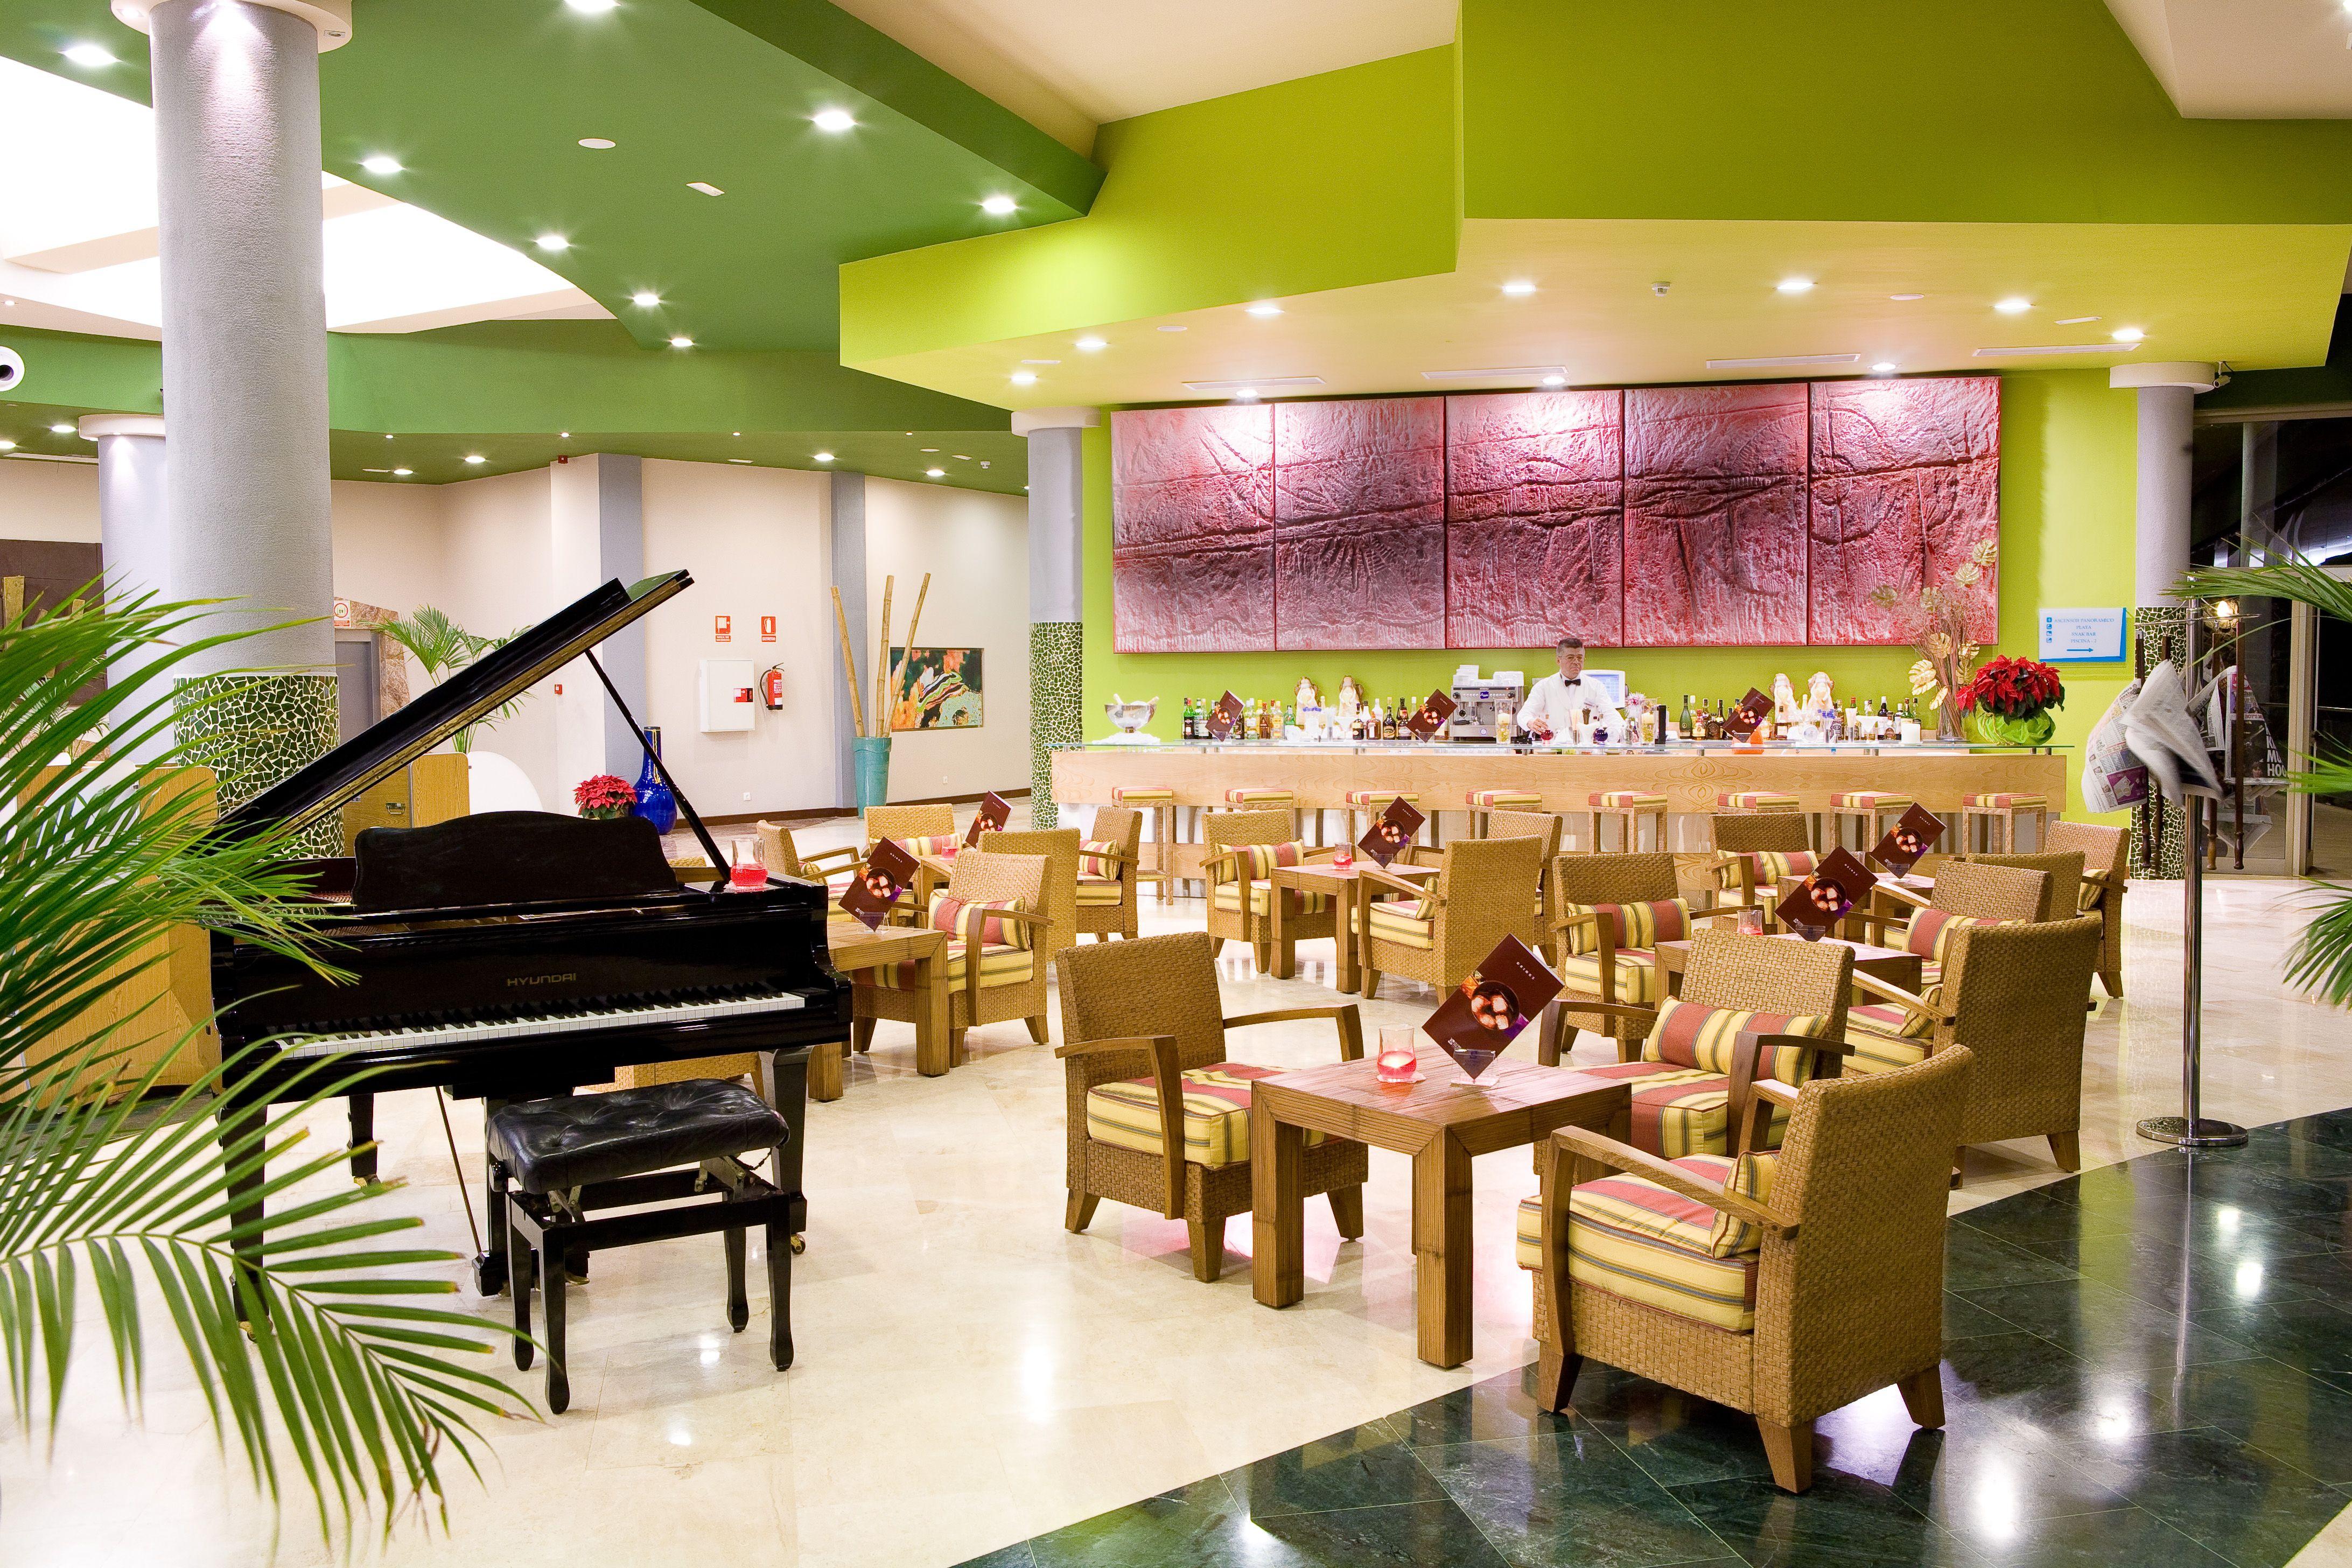 *Wellcome to the Piano Bar in Gloria Palace Royal #PianoBar #GloriaPalaceRoyal #music #GranCanaria  *Bienvenidos al Piano Bar de Gloria Palace Royal